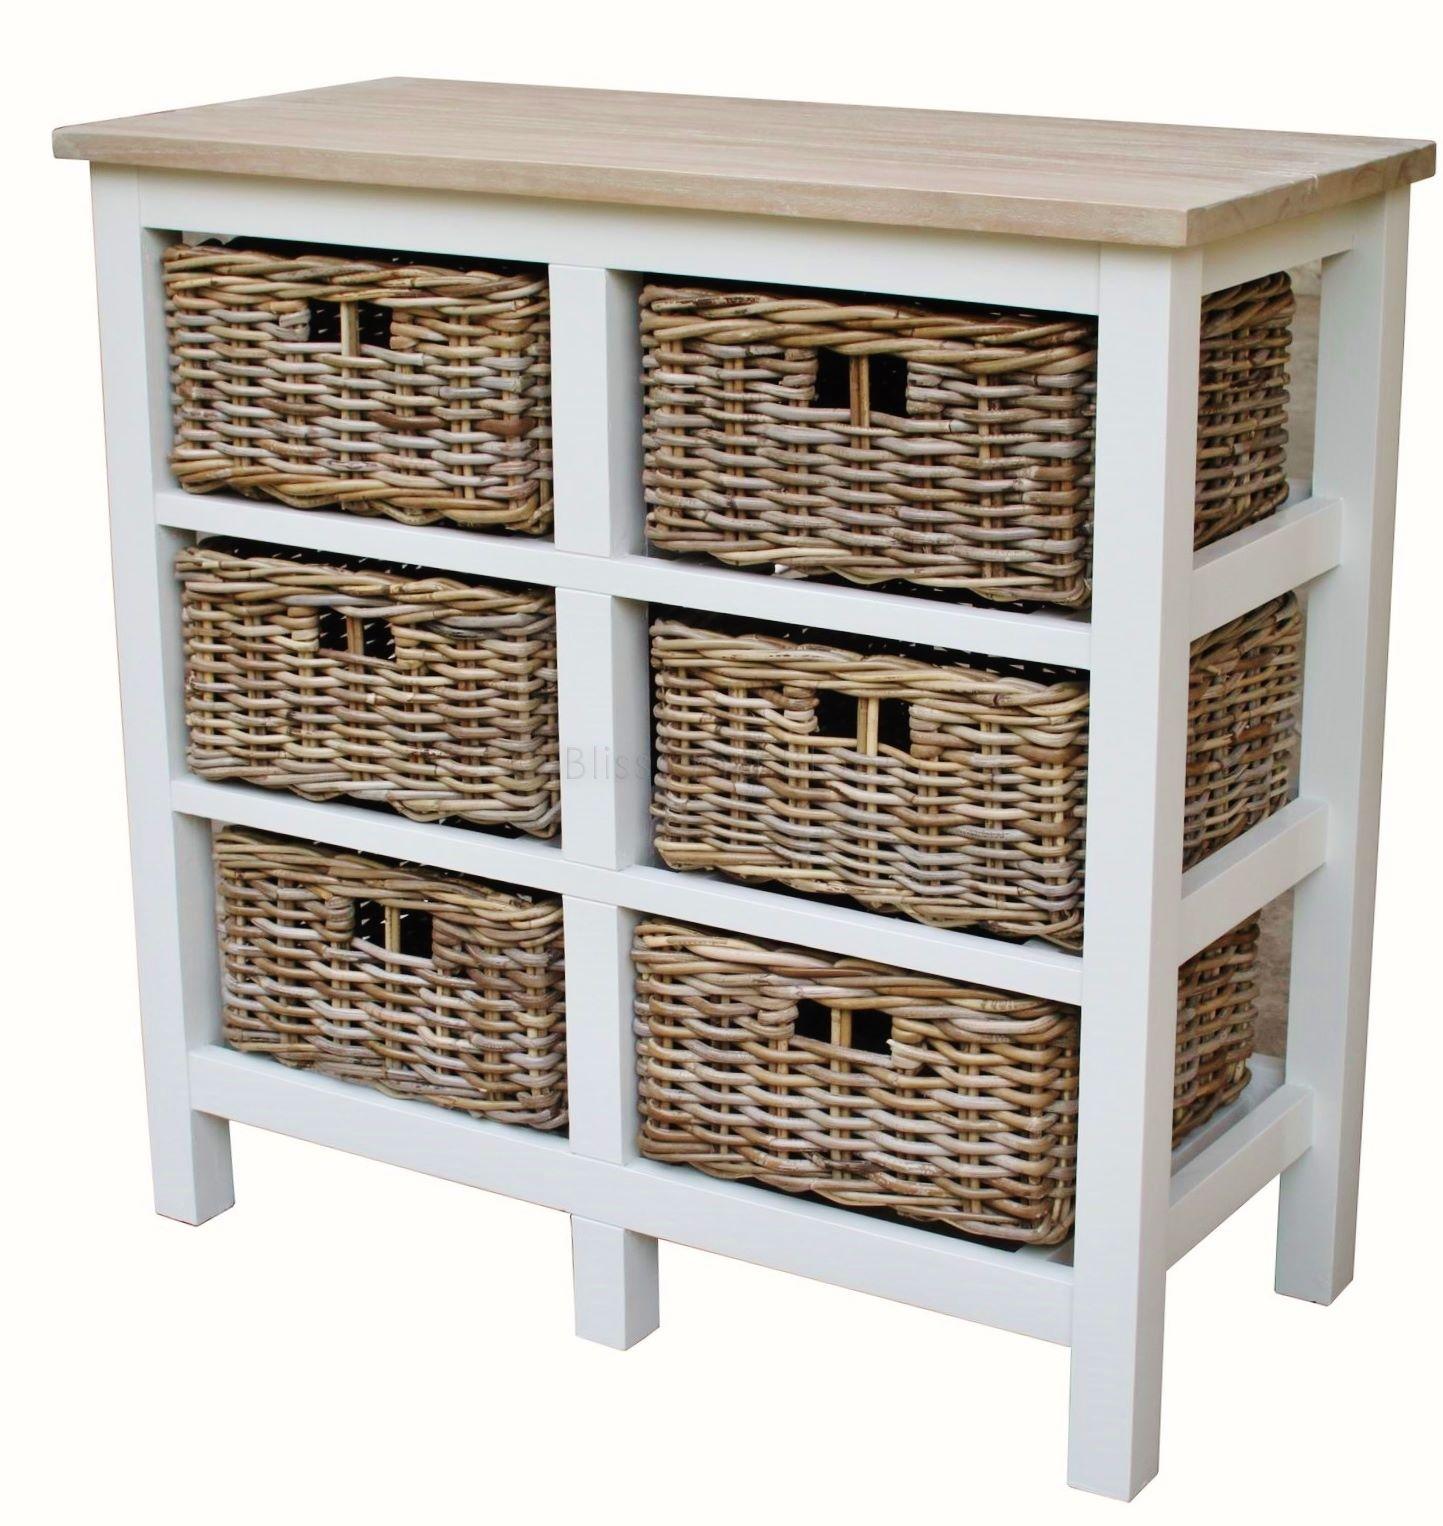 Superieur 6 Drawer Basket Storage Unit Bliss And Bloom Ltd. SaveEnlarge